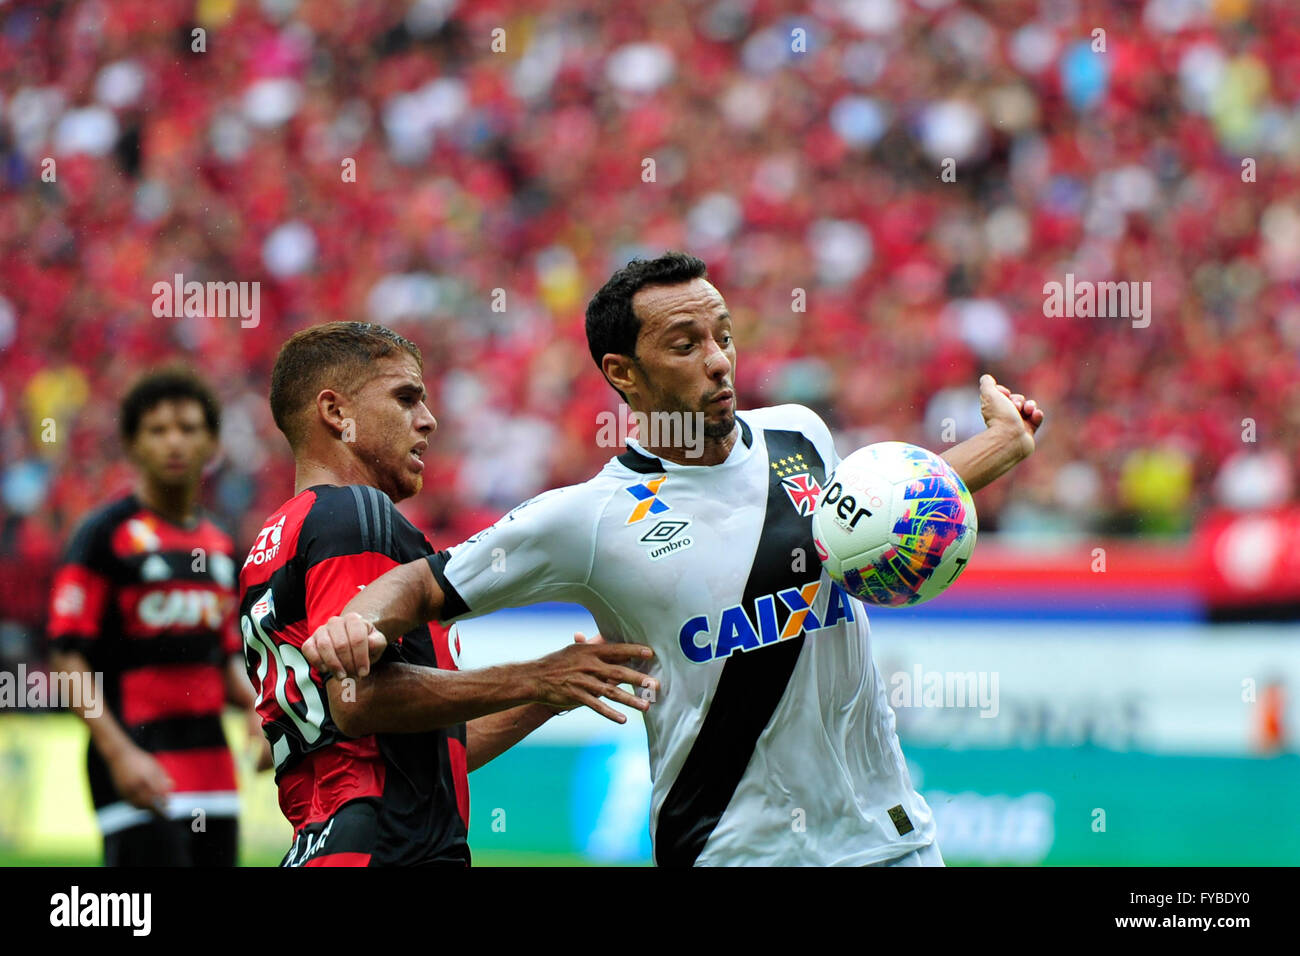 MANAUS, AM - 04/24/2016: FLAMINGO X VASCO - Dispute ball during Flamengo x Vasco held at the Arena da Amaz?nia. - Stock Image